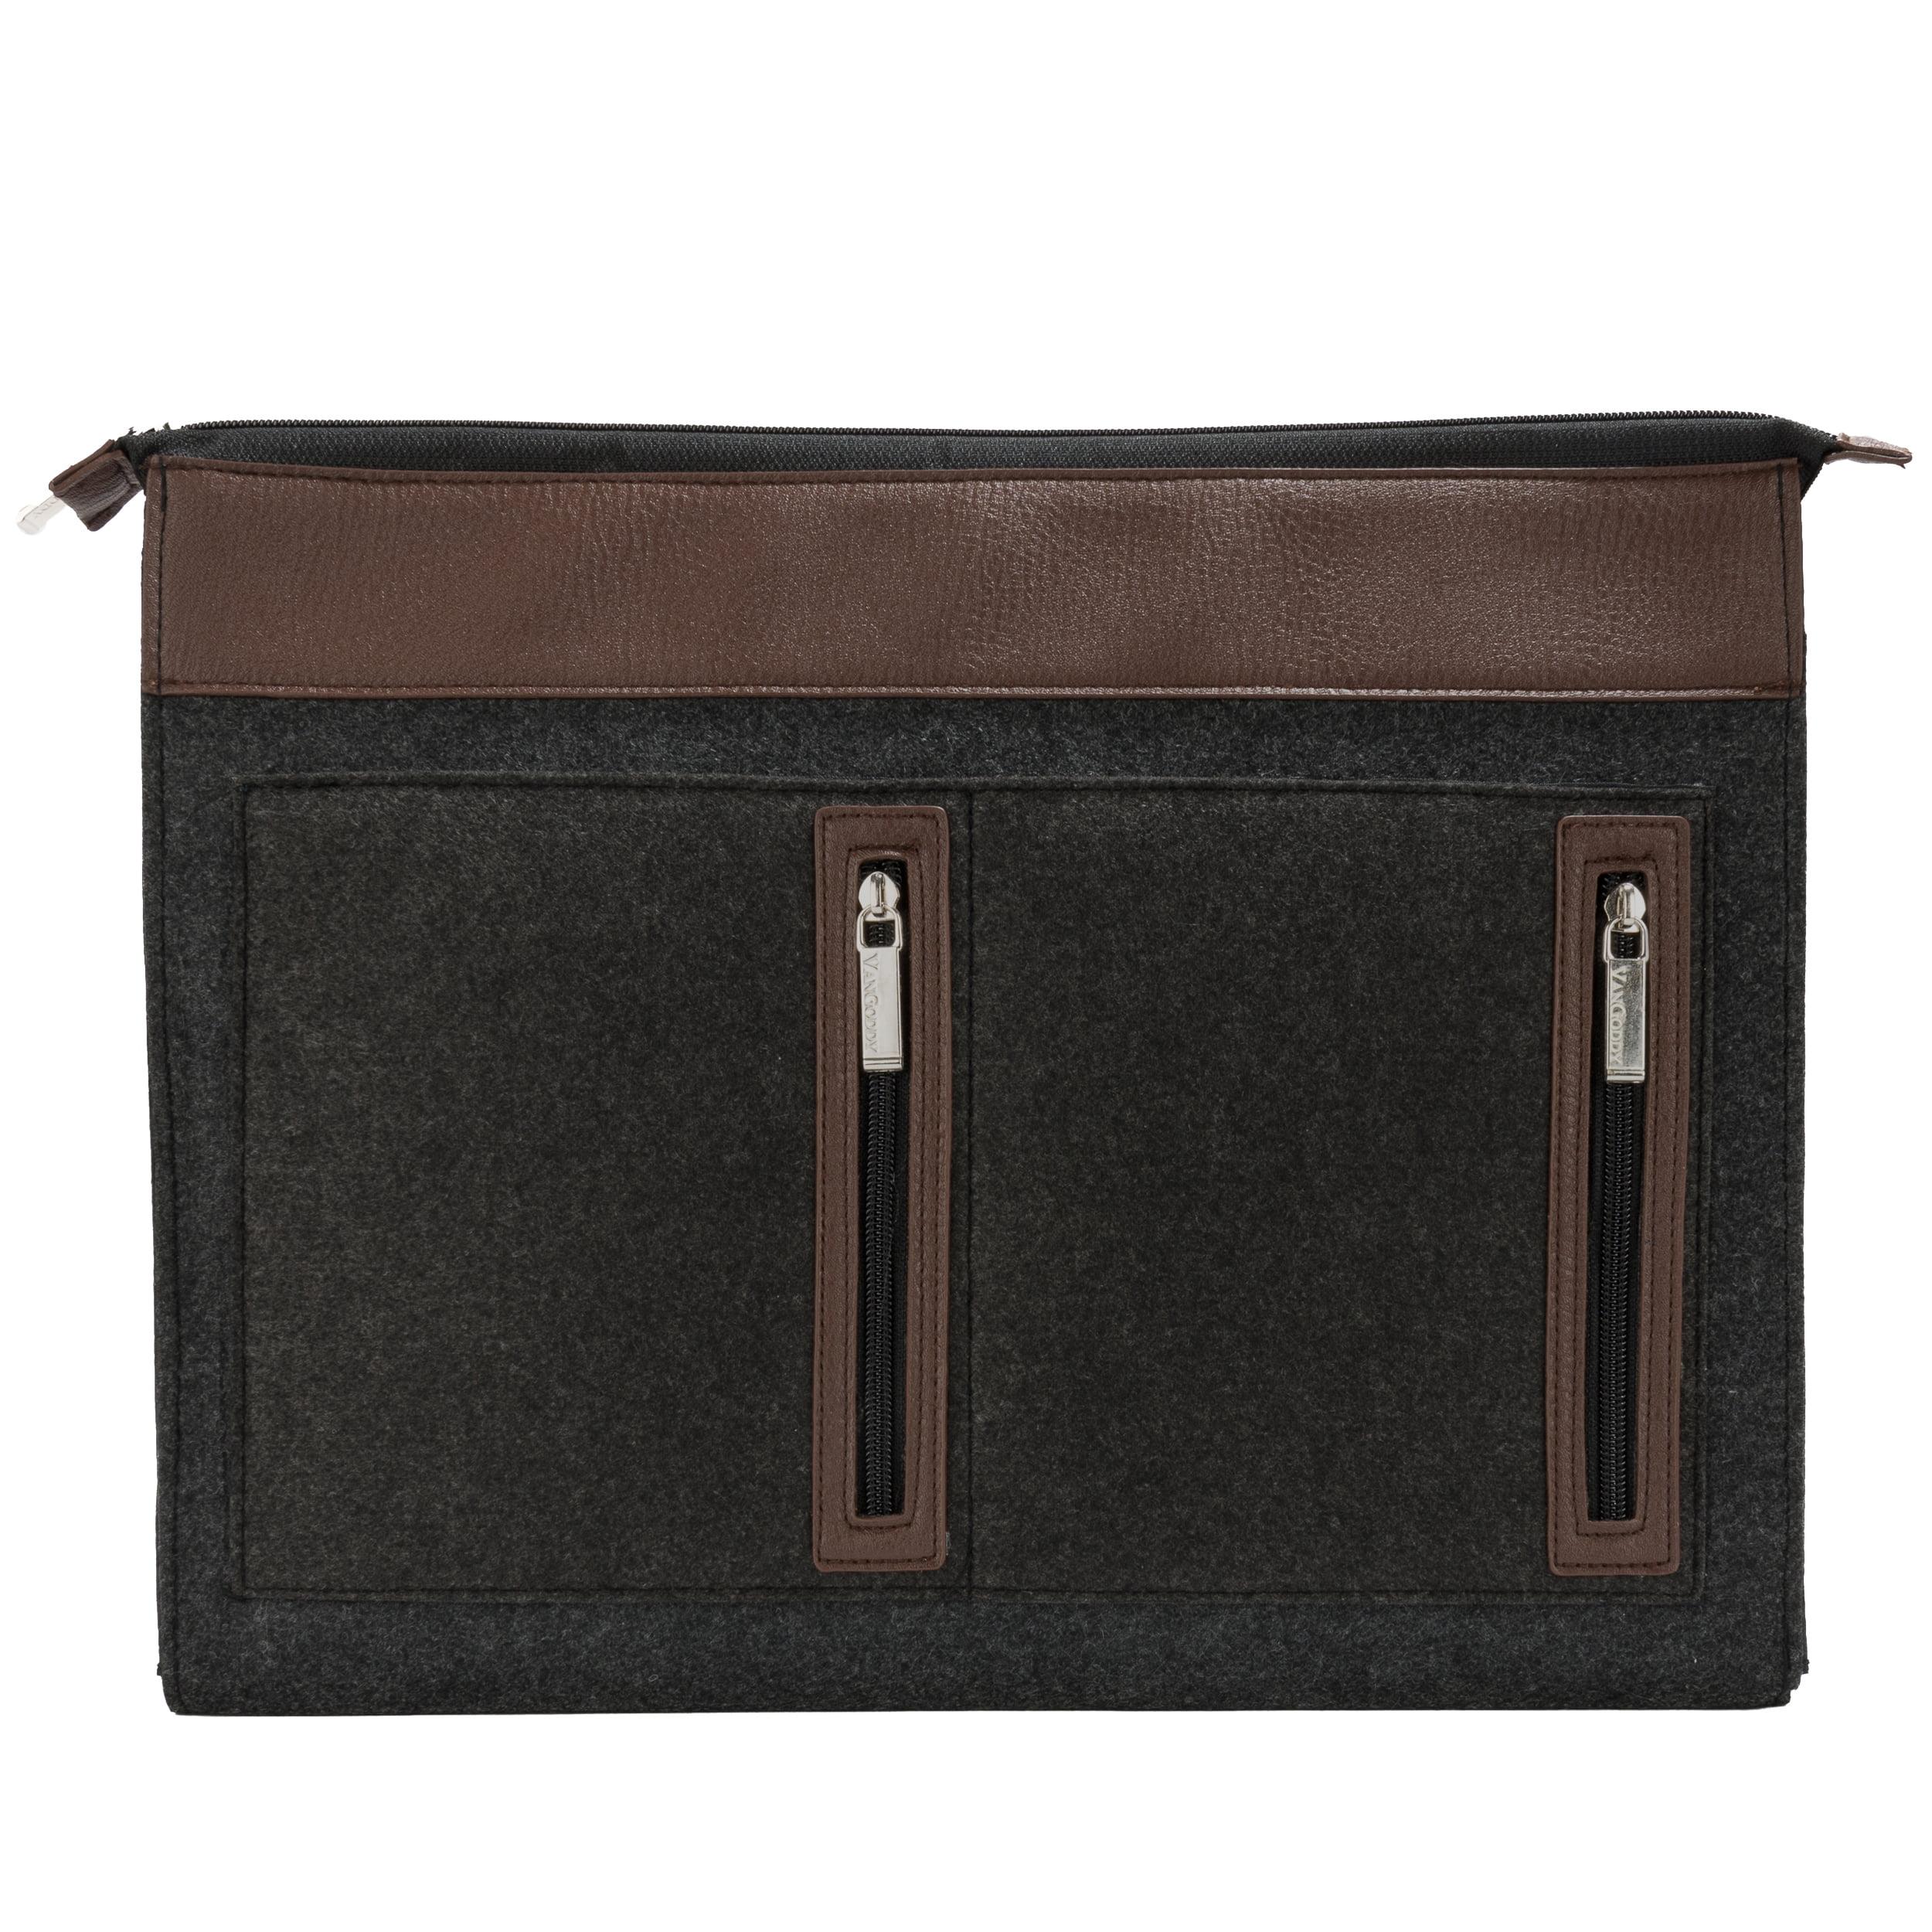 Exo Trim Protective Wool Felt Laptop Sleeve for APPLE, ACER, ASUS, DELL, LENOVO